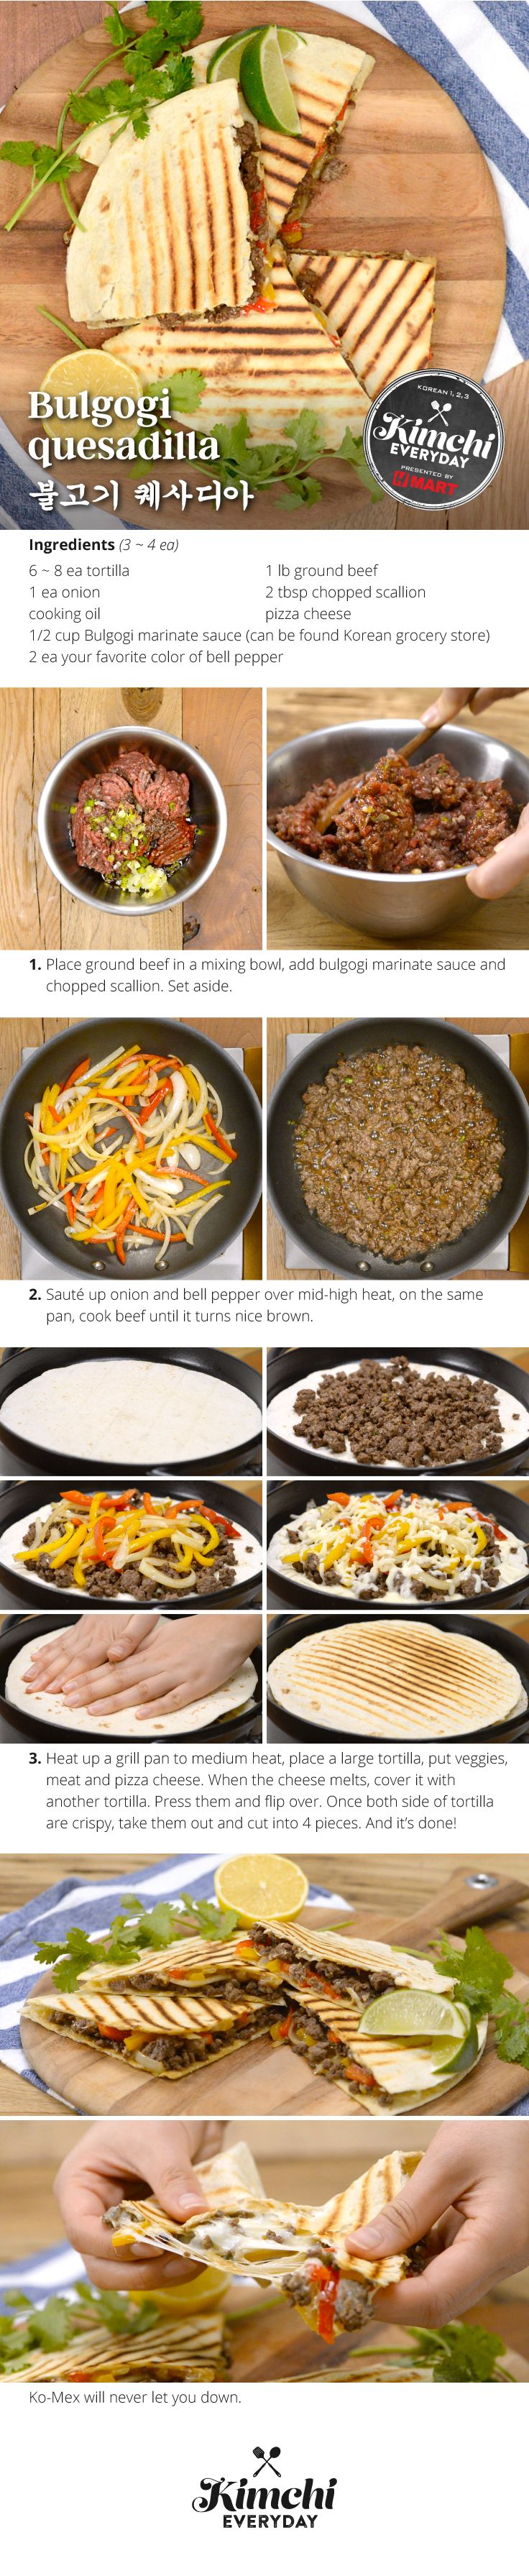 105 best kimchi everyday recipe images on pinterest hmart presents bugolgi quesadilla forumfinder Gallery